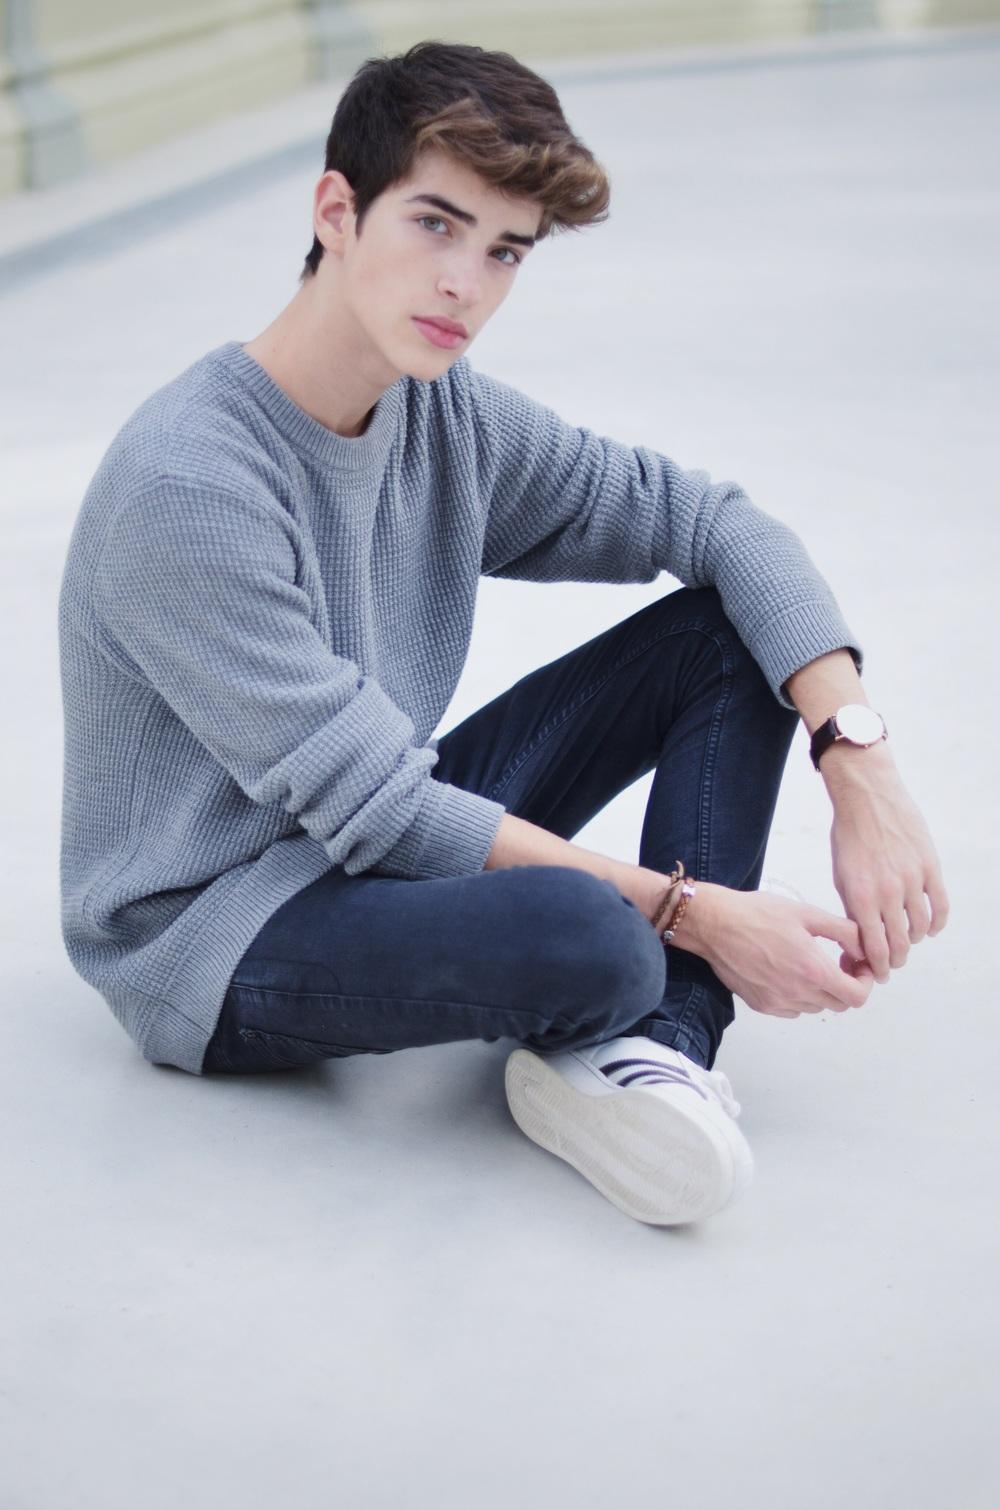 Handsome 16 Year Old Boy: MANURIOS